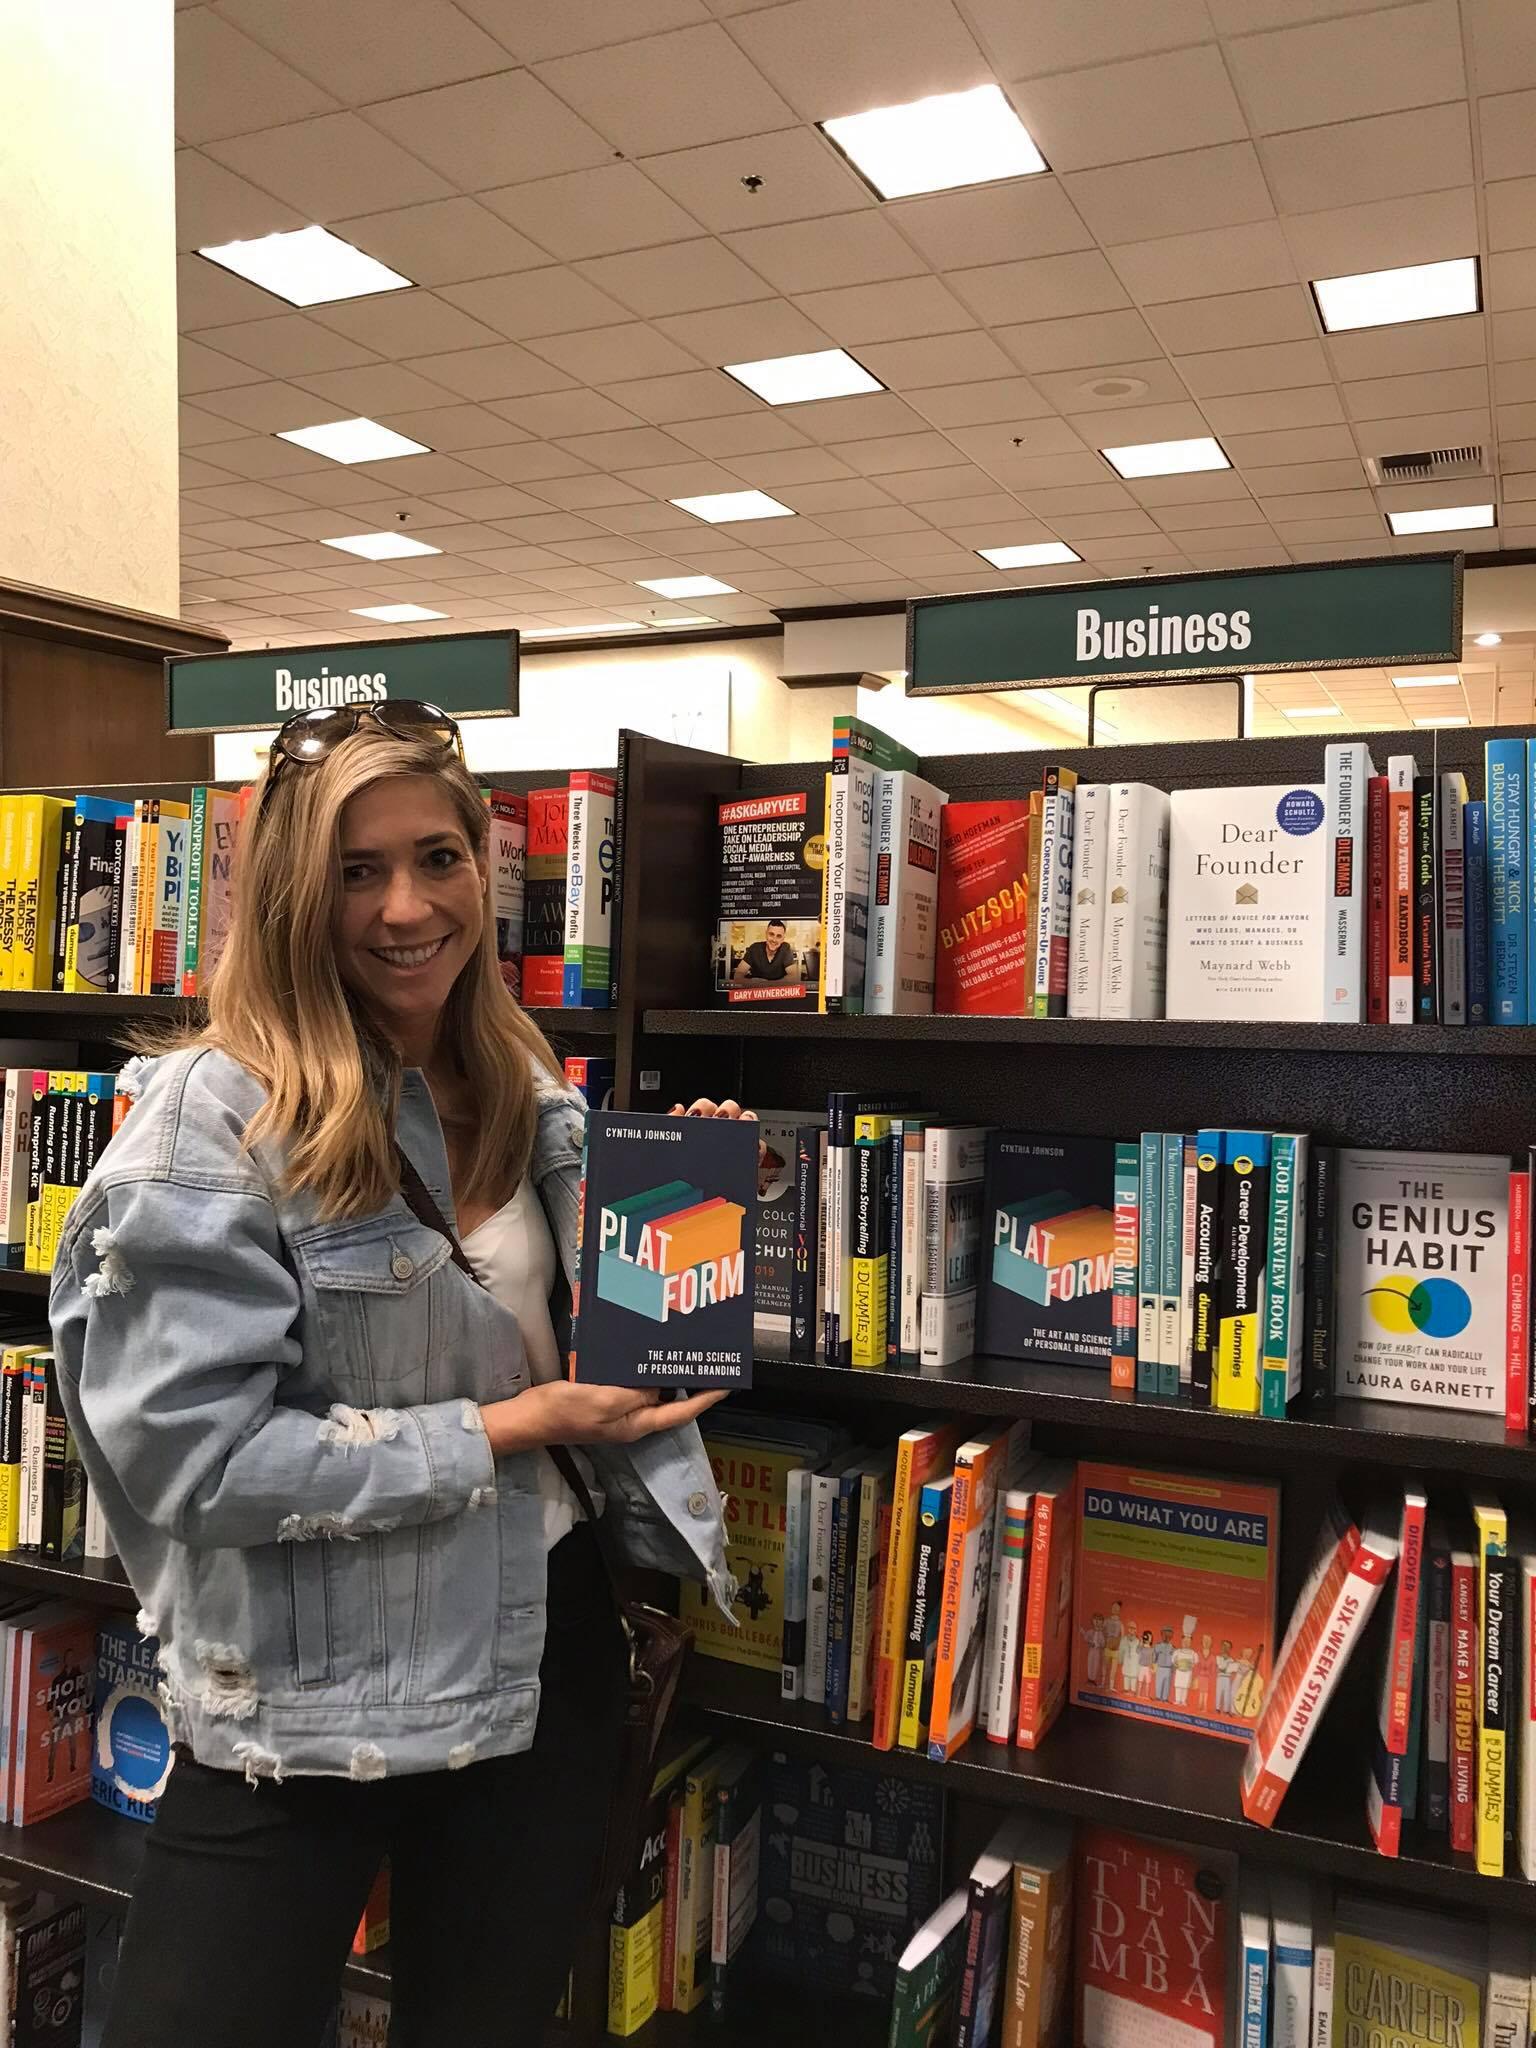 PLATFORM Book in Barnes & Noble